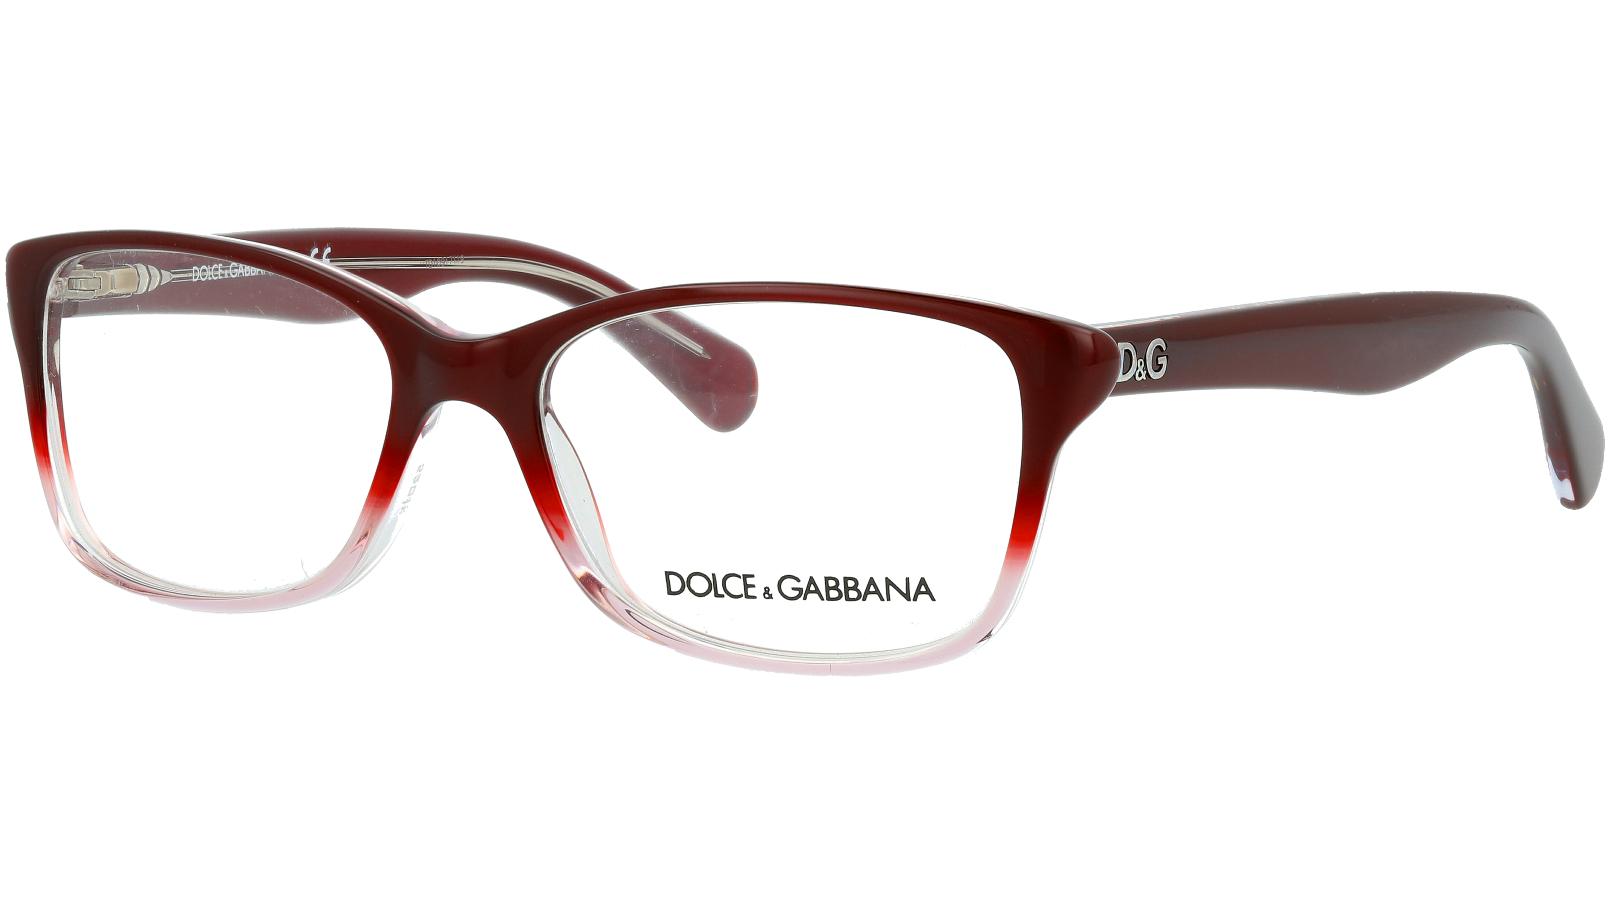 Dolce&Gabbana DD1246 2601 52 RED Glasses